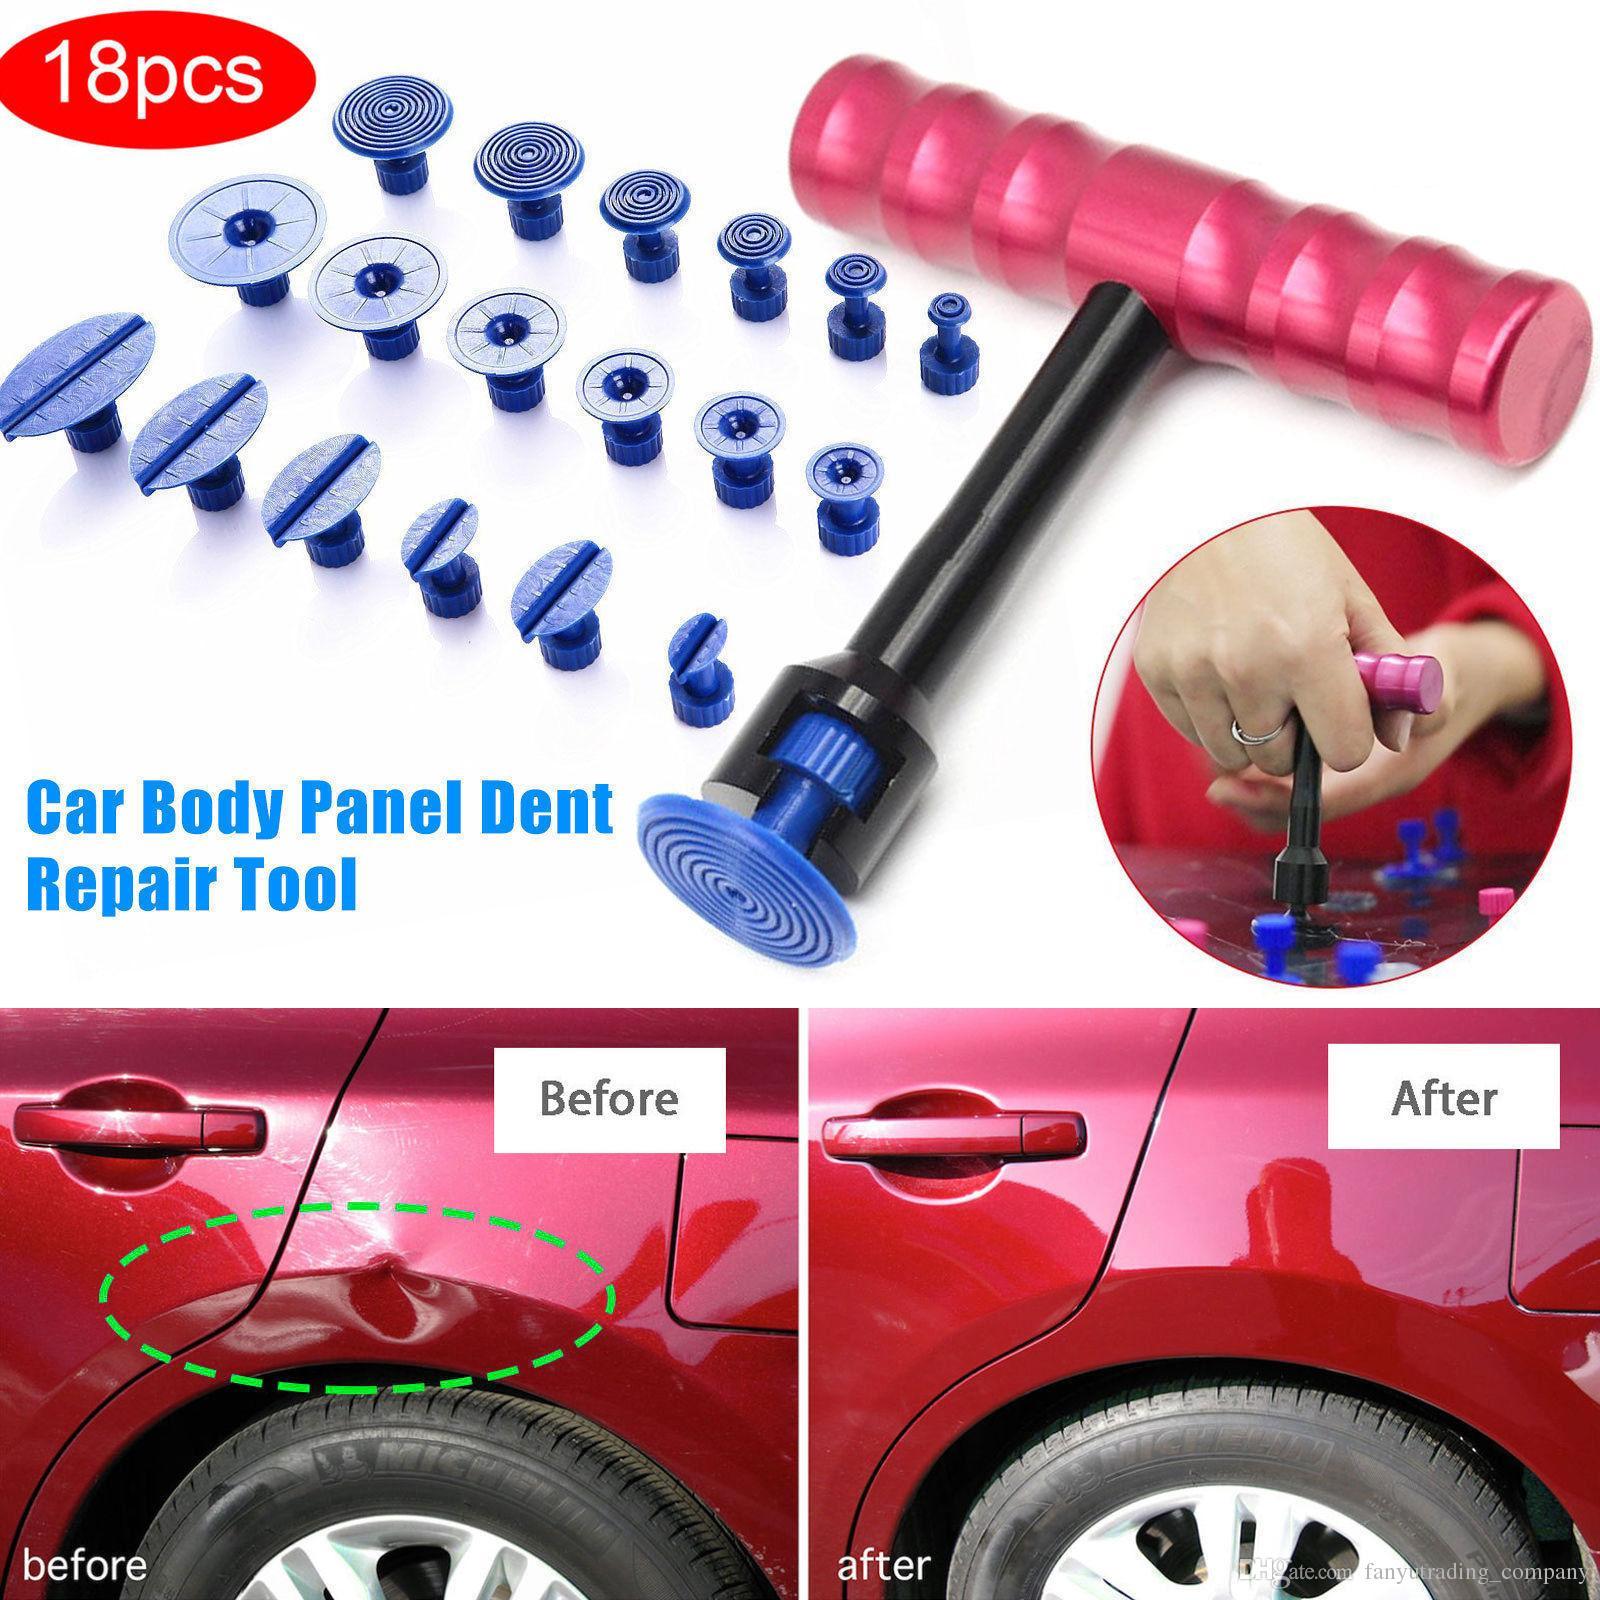 Profesional 18 Unids T-Bar Car Body Panel Paintless Abolladura Remoción Herramienta de Reparación Levantador + Extractor Tabs Coche Moto Daño Remoción Envío Gratis